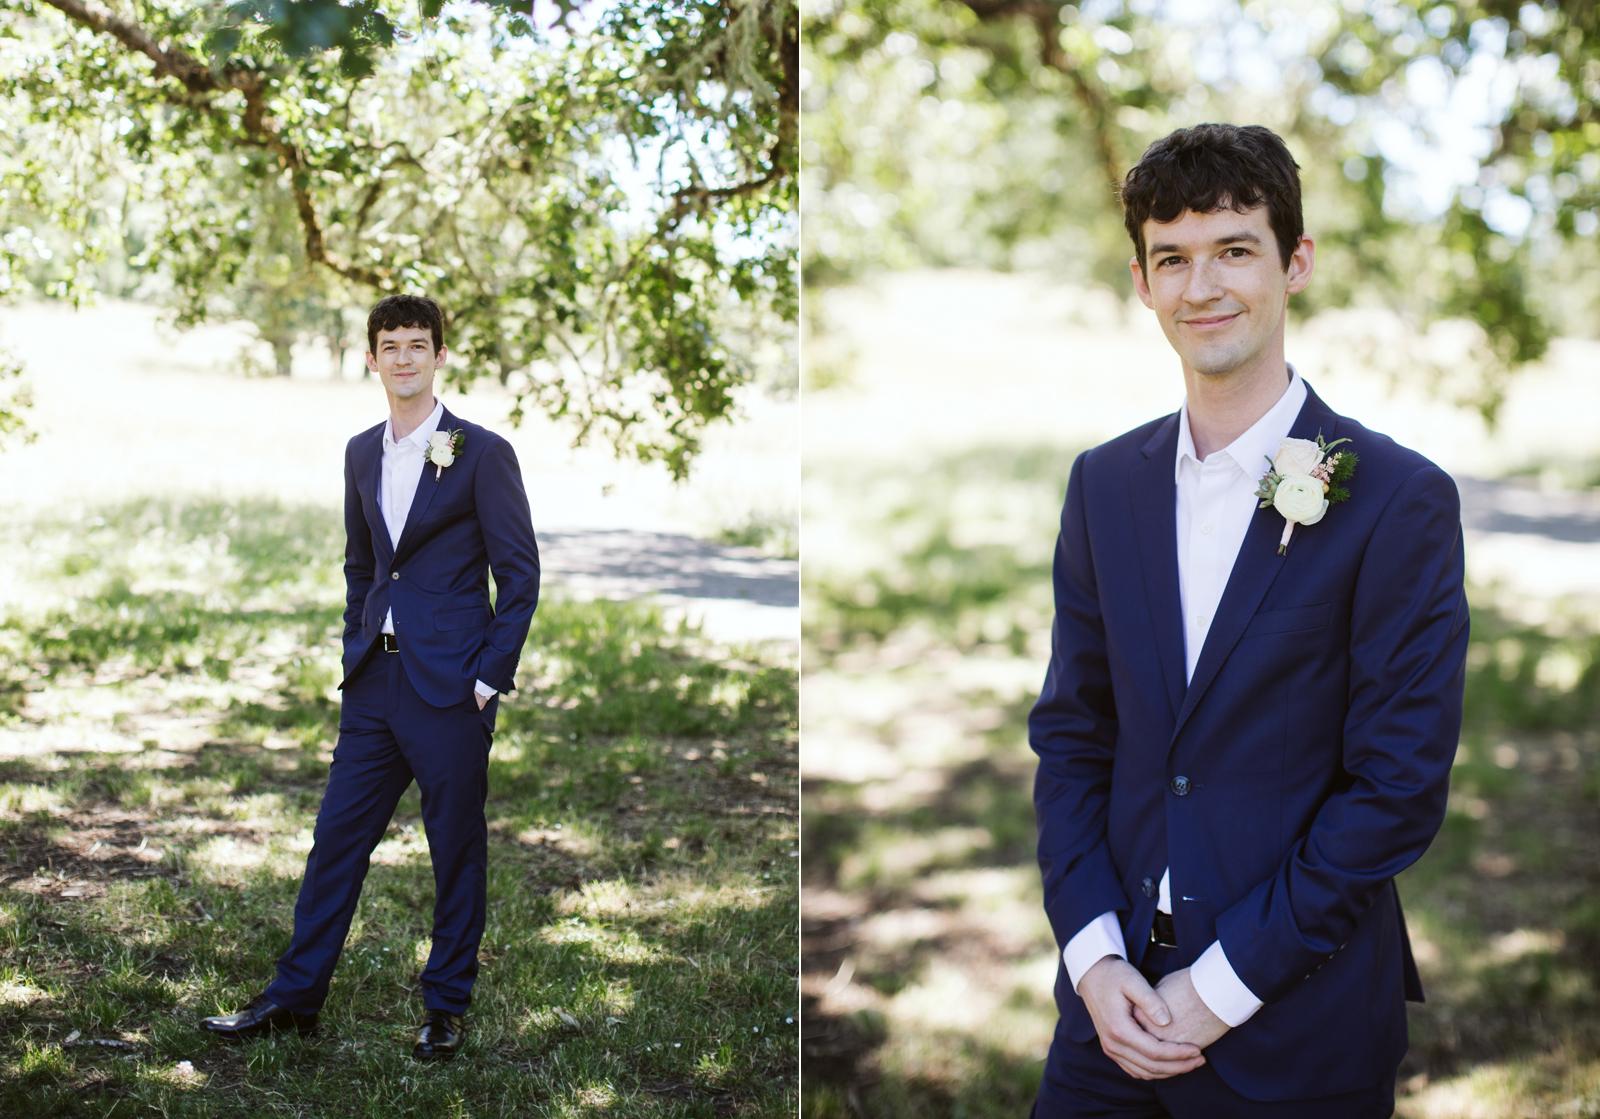 015-daronjackson-rachel-michael-wedding-mtpisgah.jpg